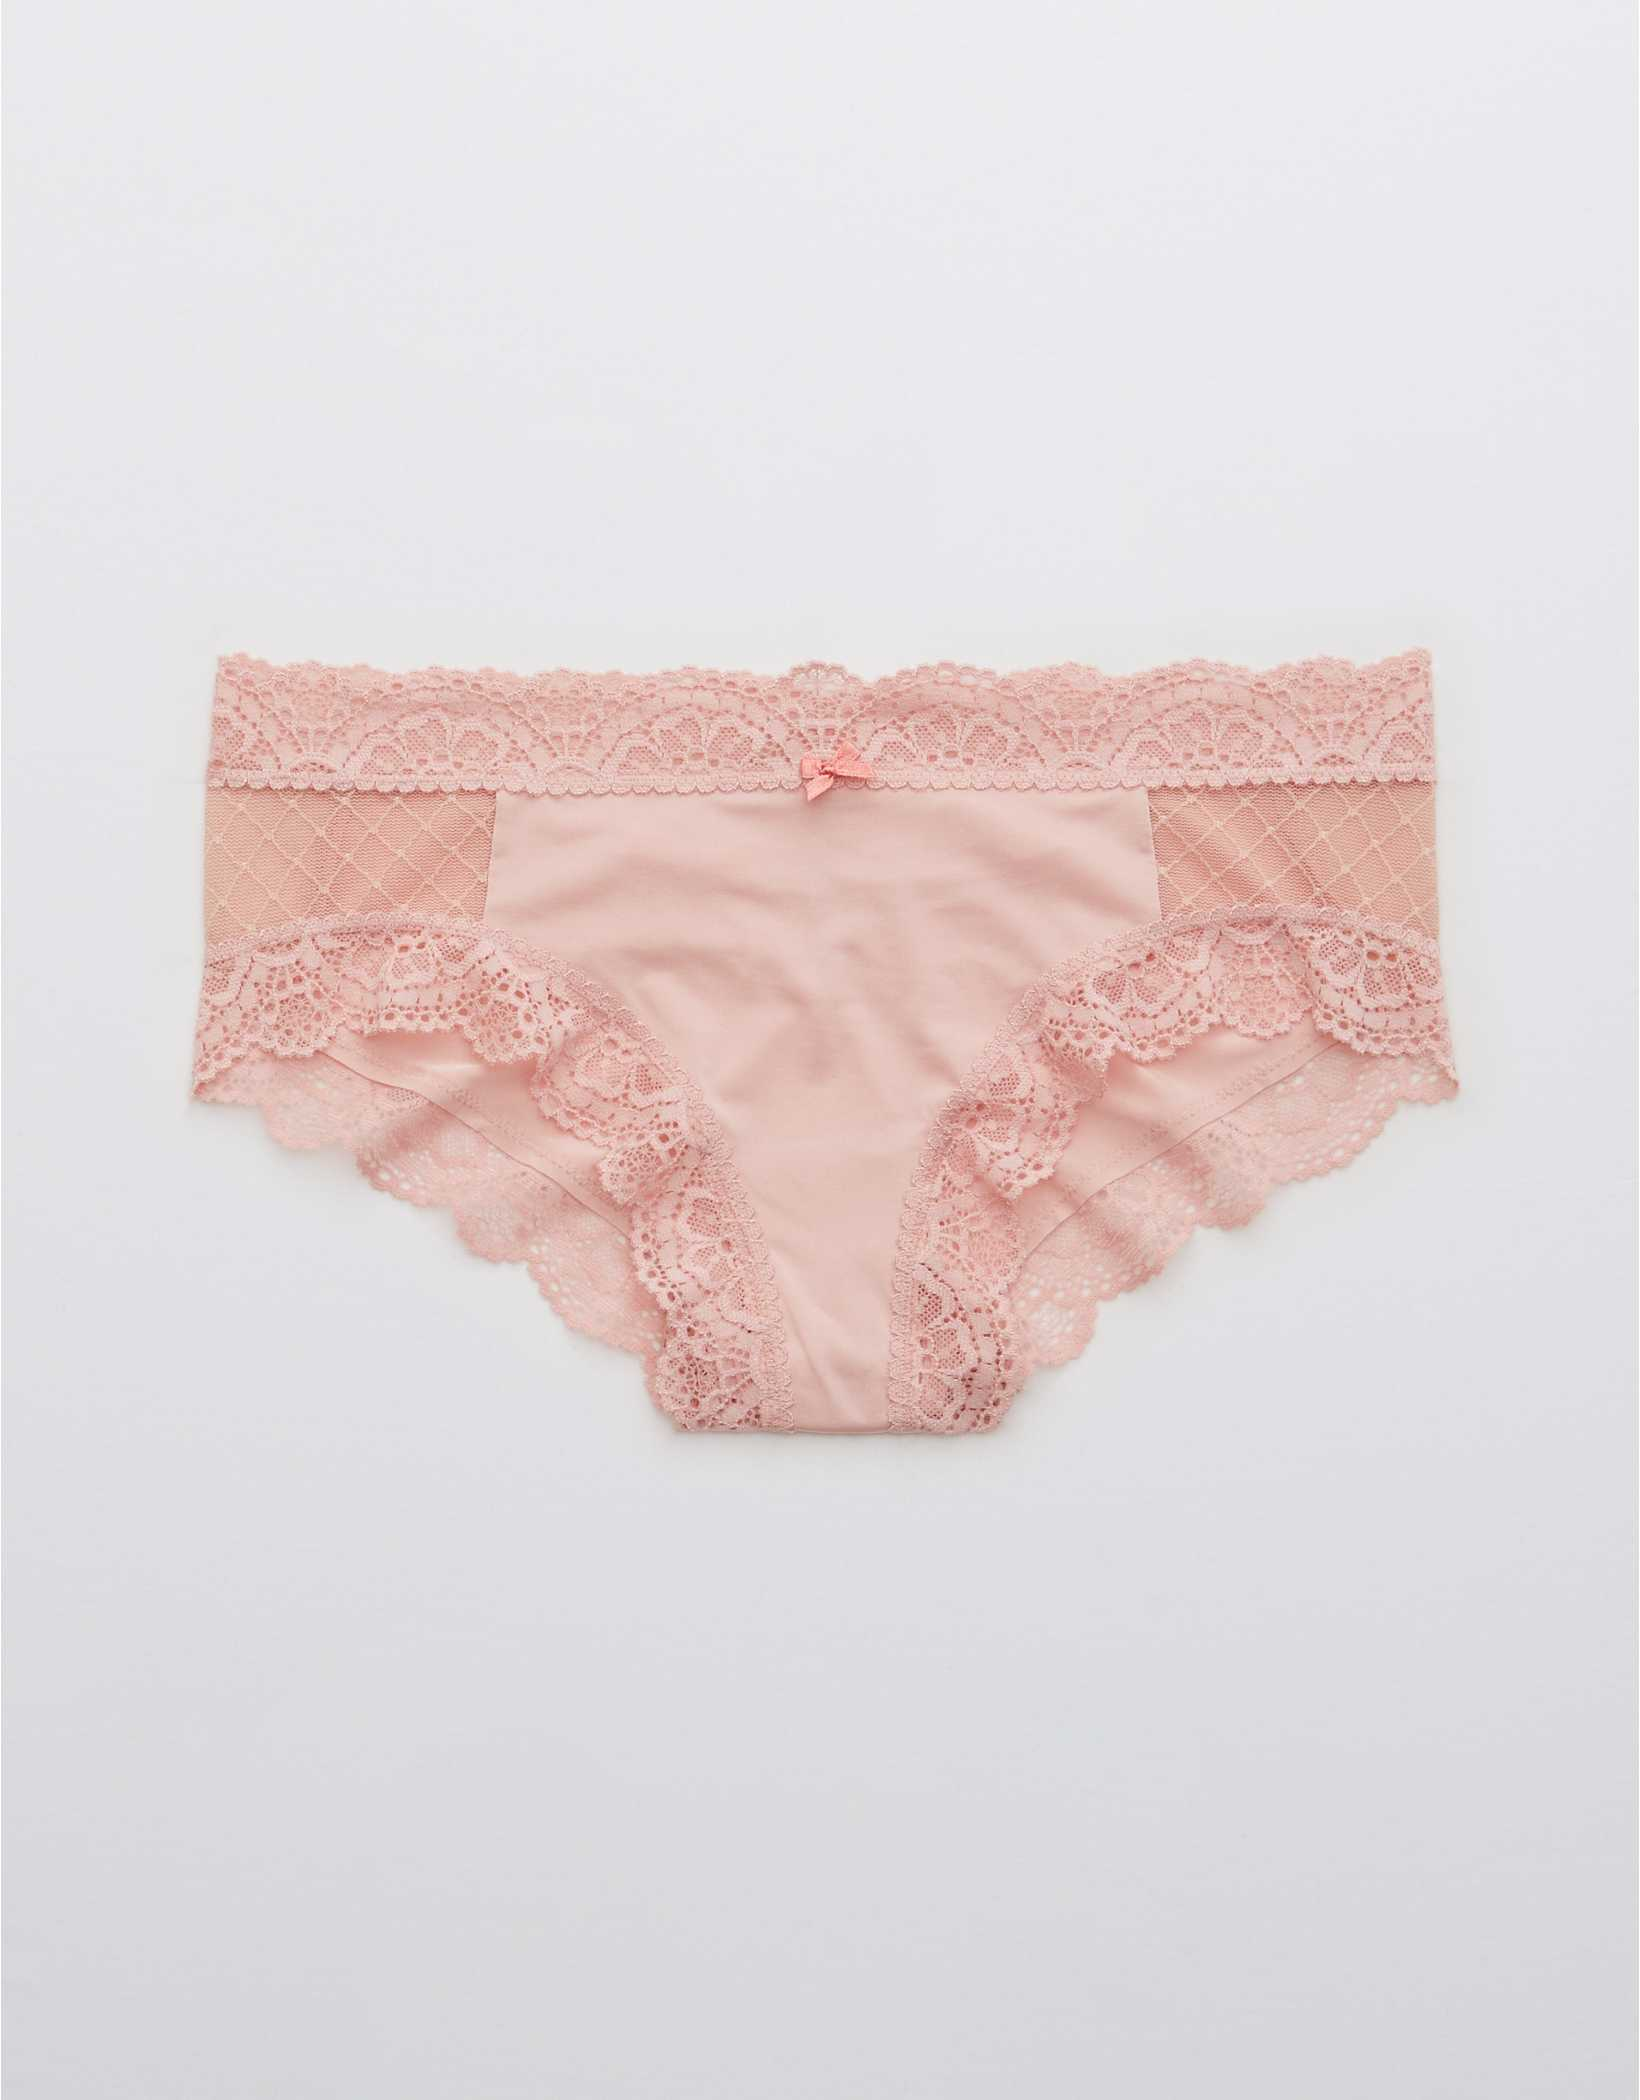 Aerie Slumber Party Lace Shine Cheeky Underwear